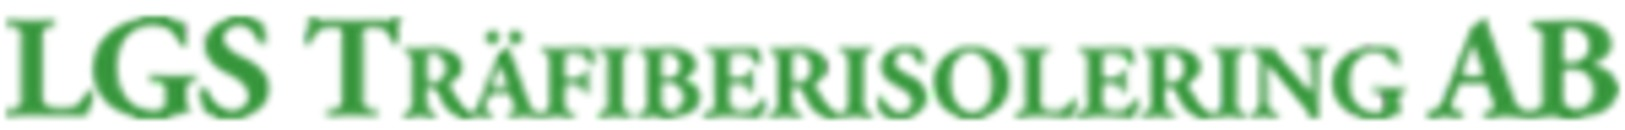 Lgs Träfiberisolering AB logo